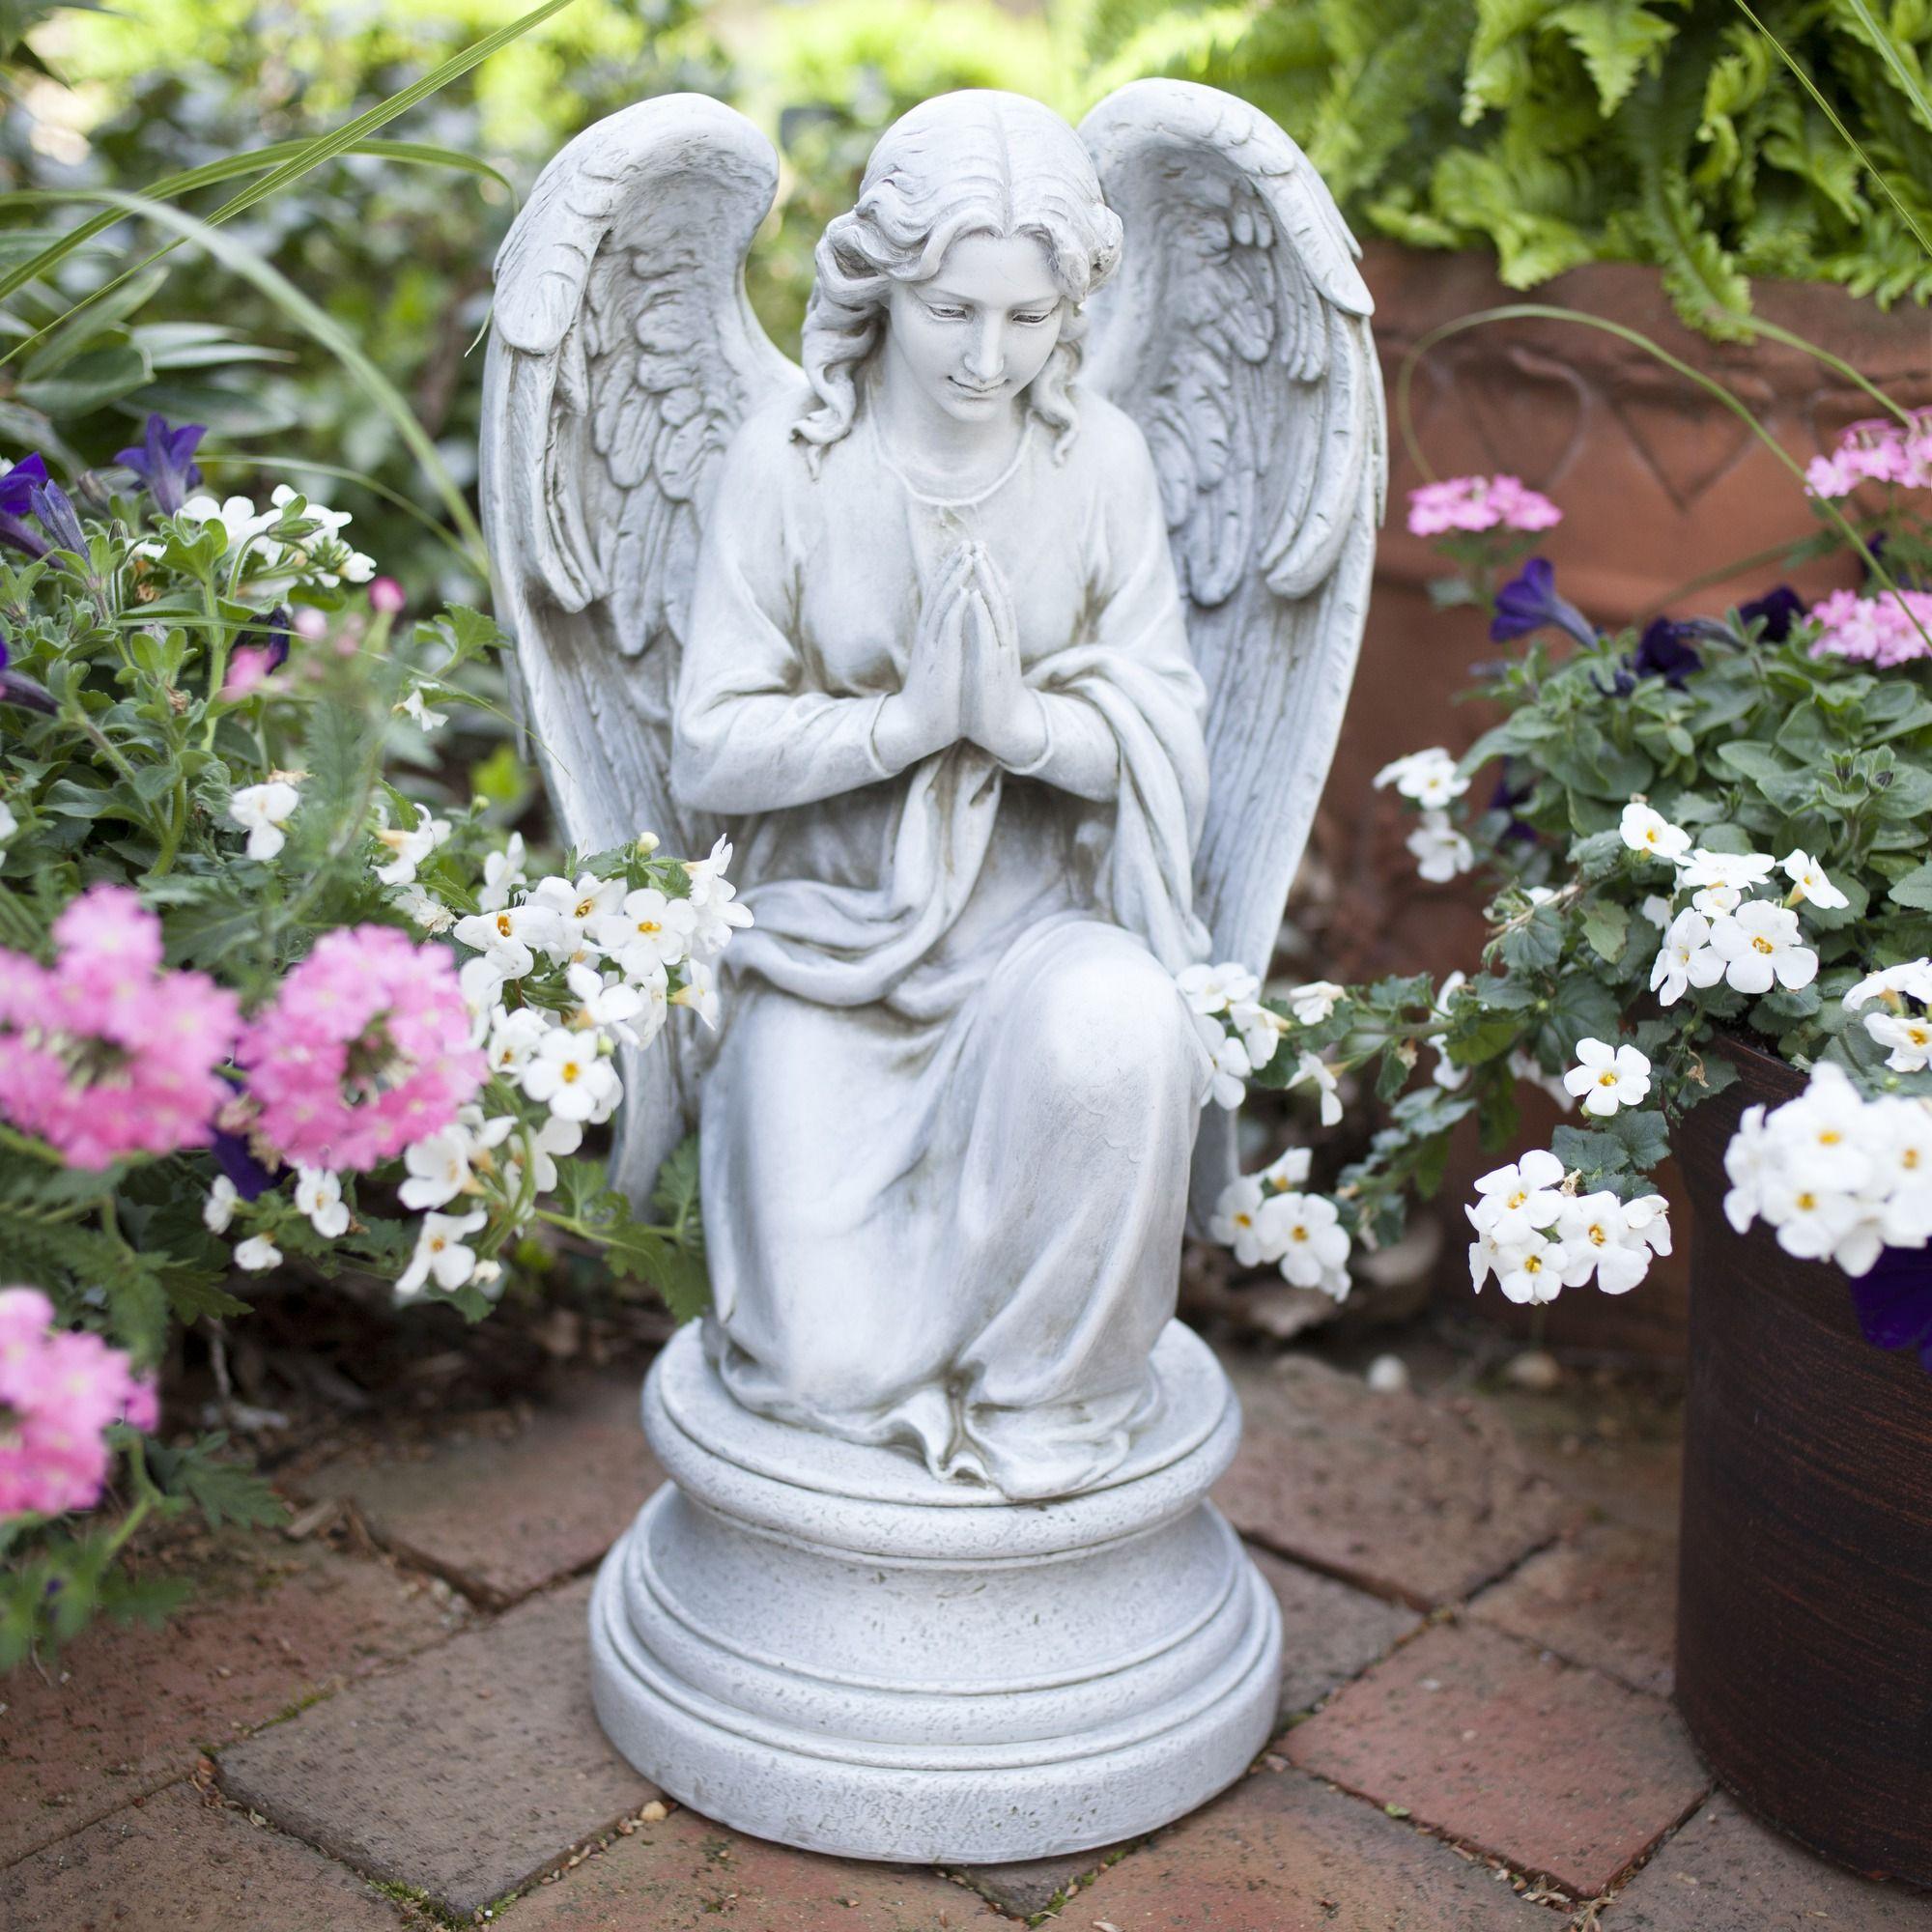 kneeling praying guardian angel outdoor statue guardian angels angel and garden statues. Black Bedroom Furniture Sets. Home Design Ideas